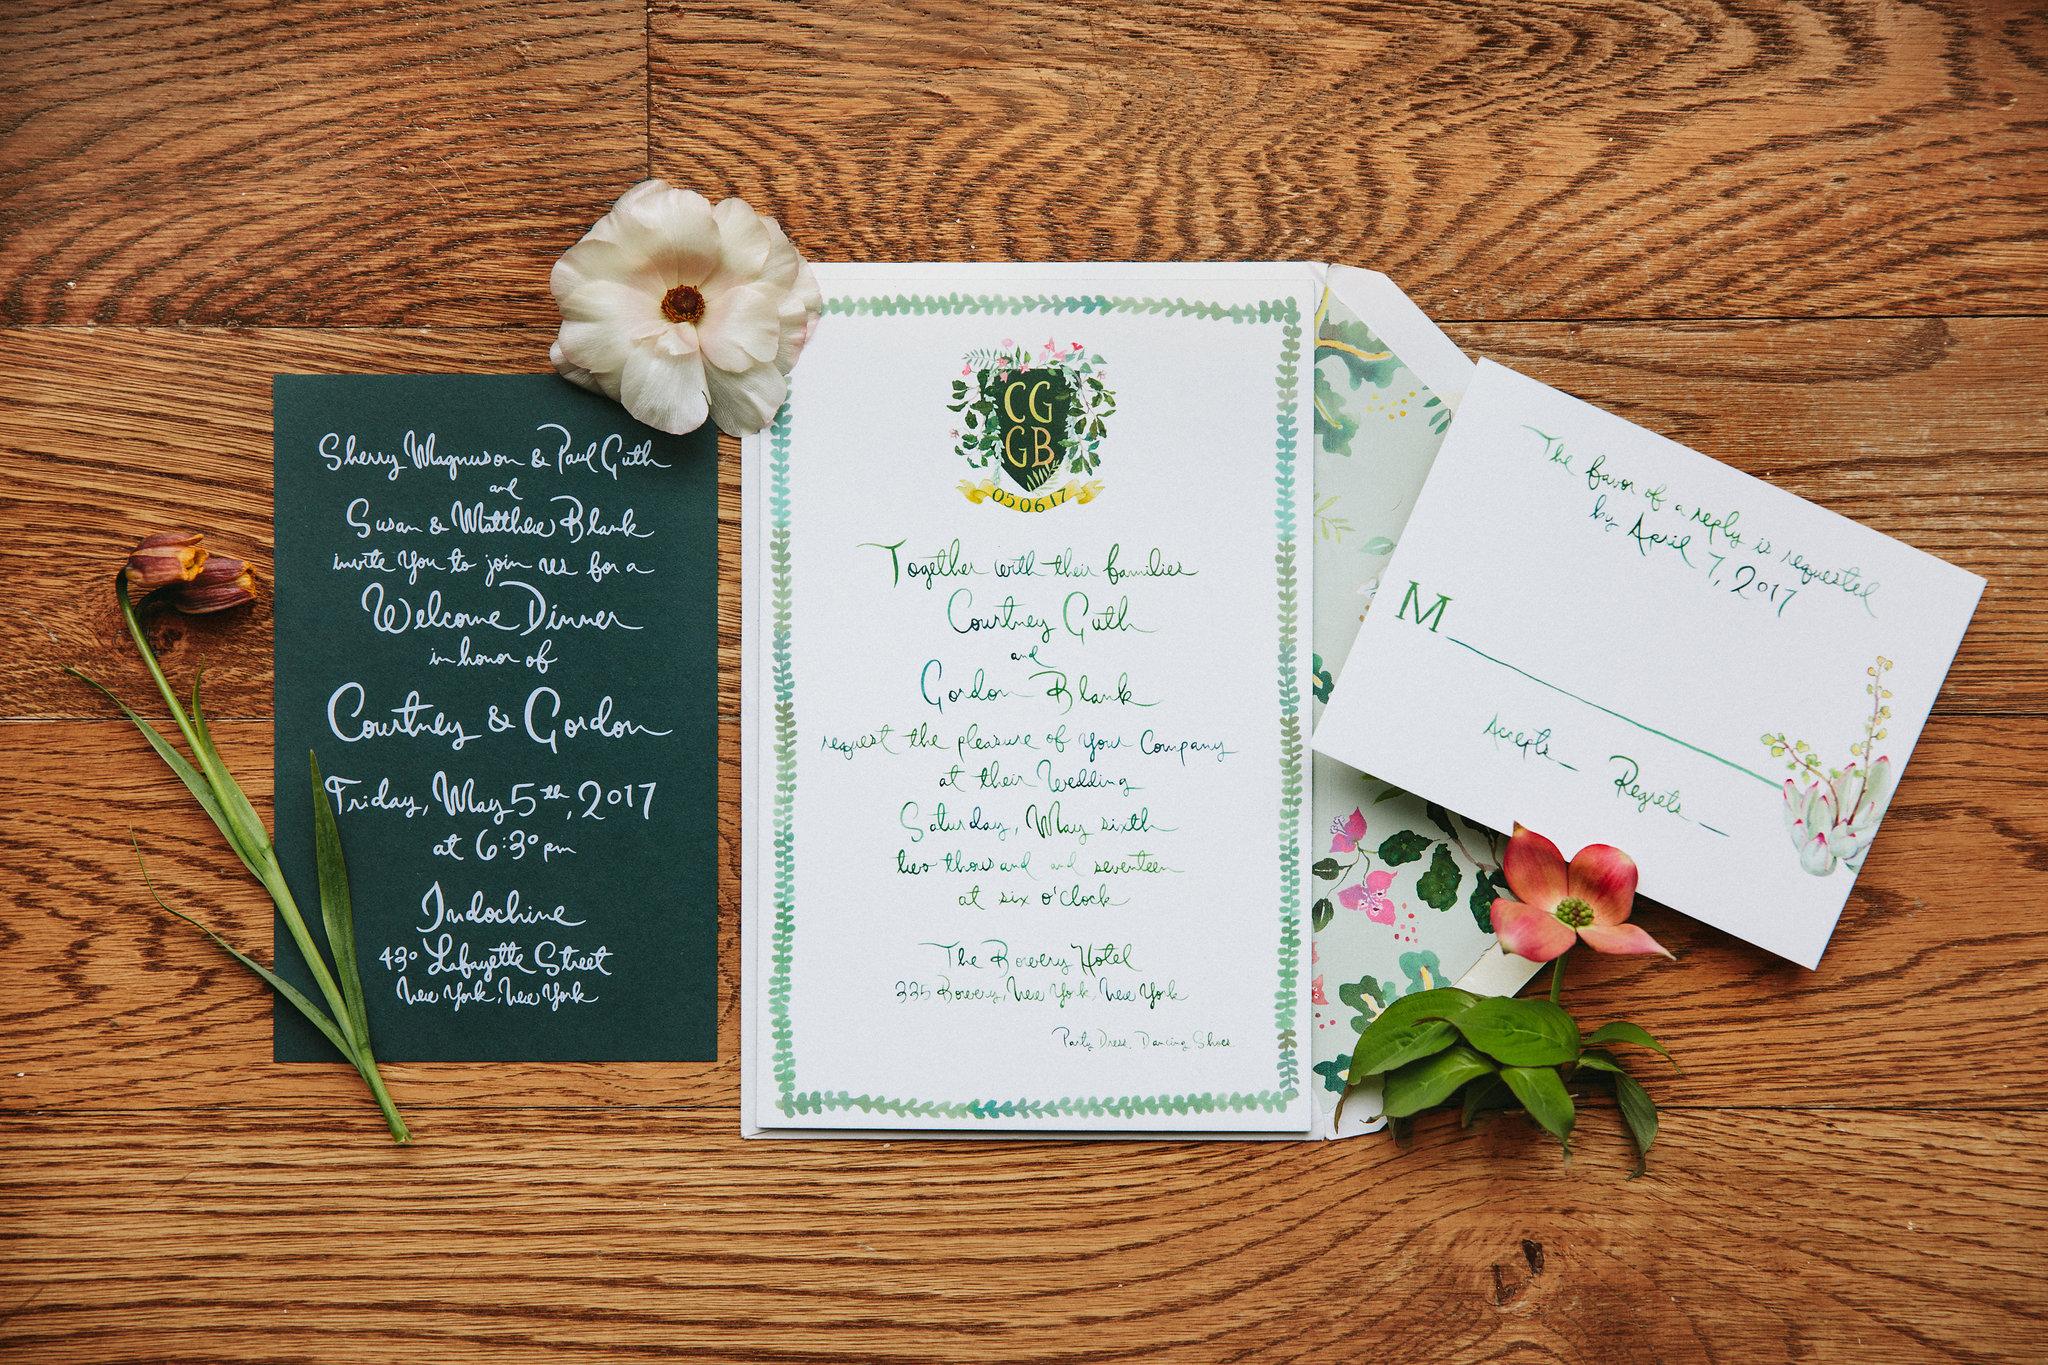 bowery-hotel-wedding-jove-meyer-events-03.jpg